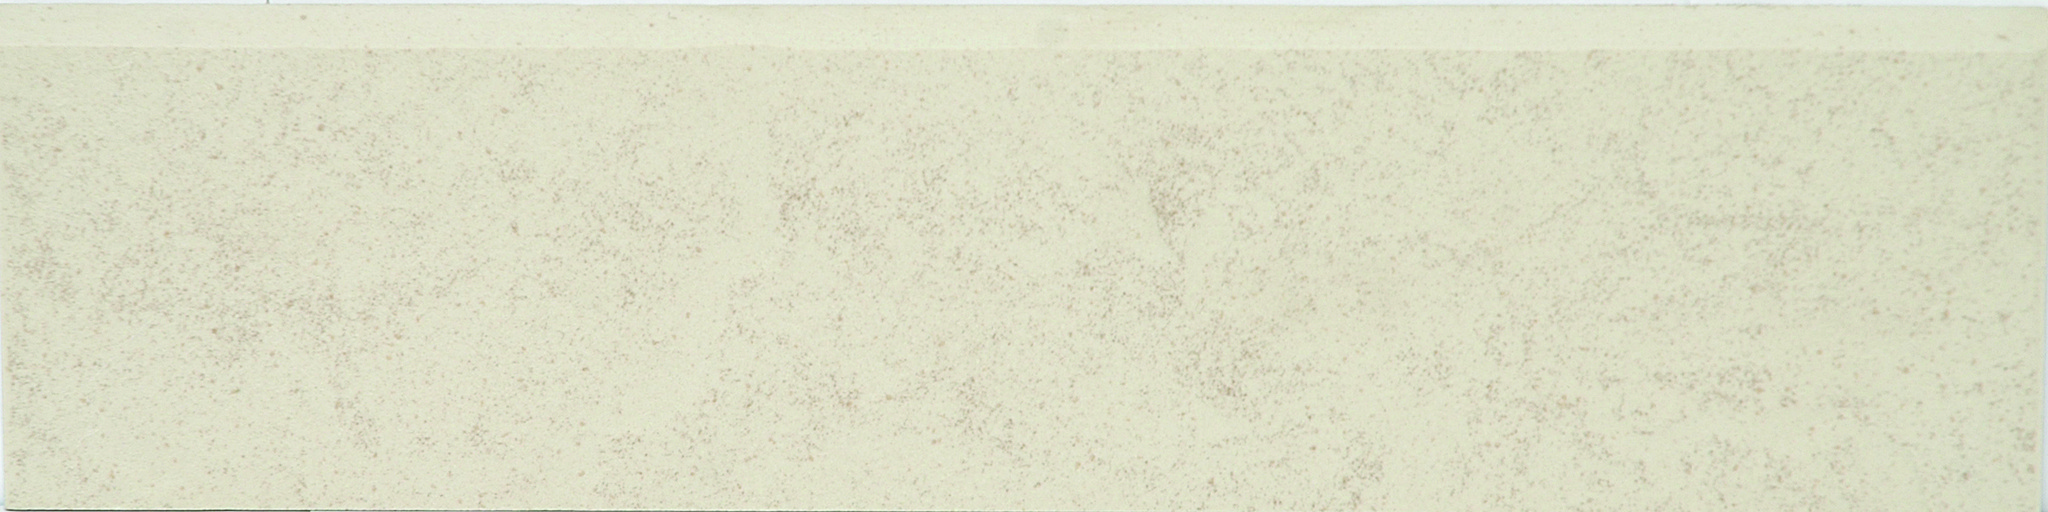 Керамогранит WHITE 80 7,6X30